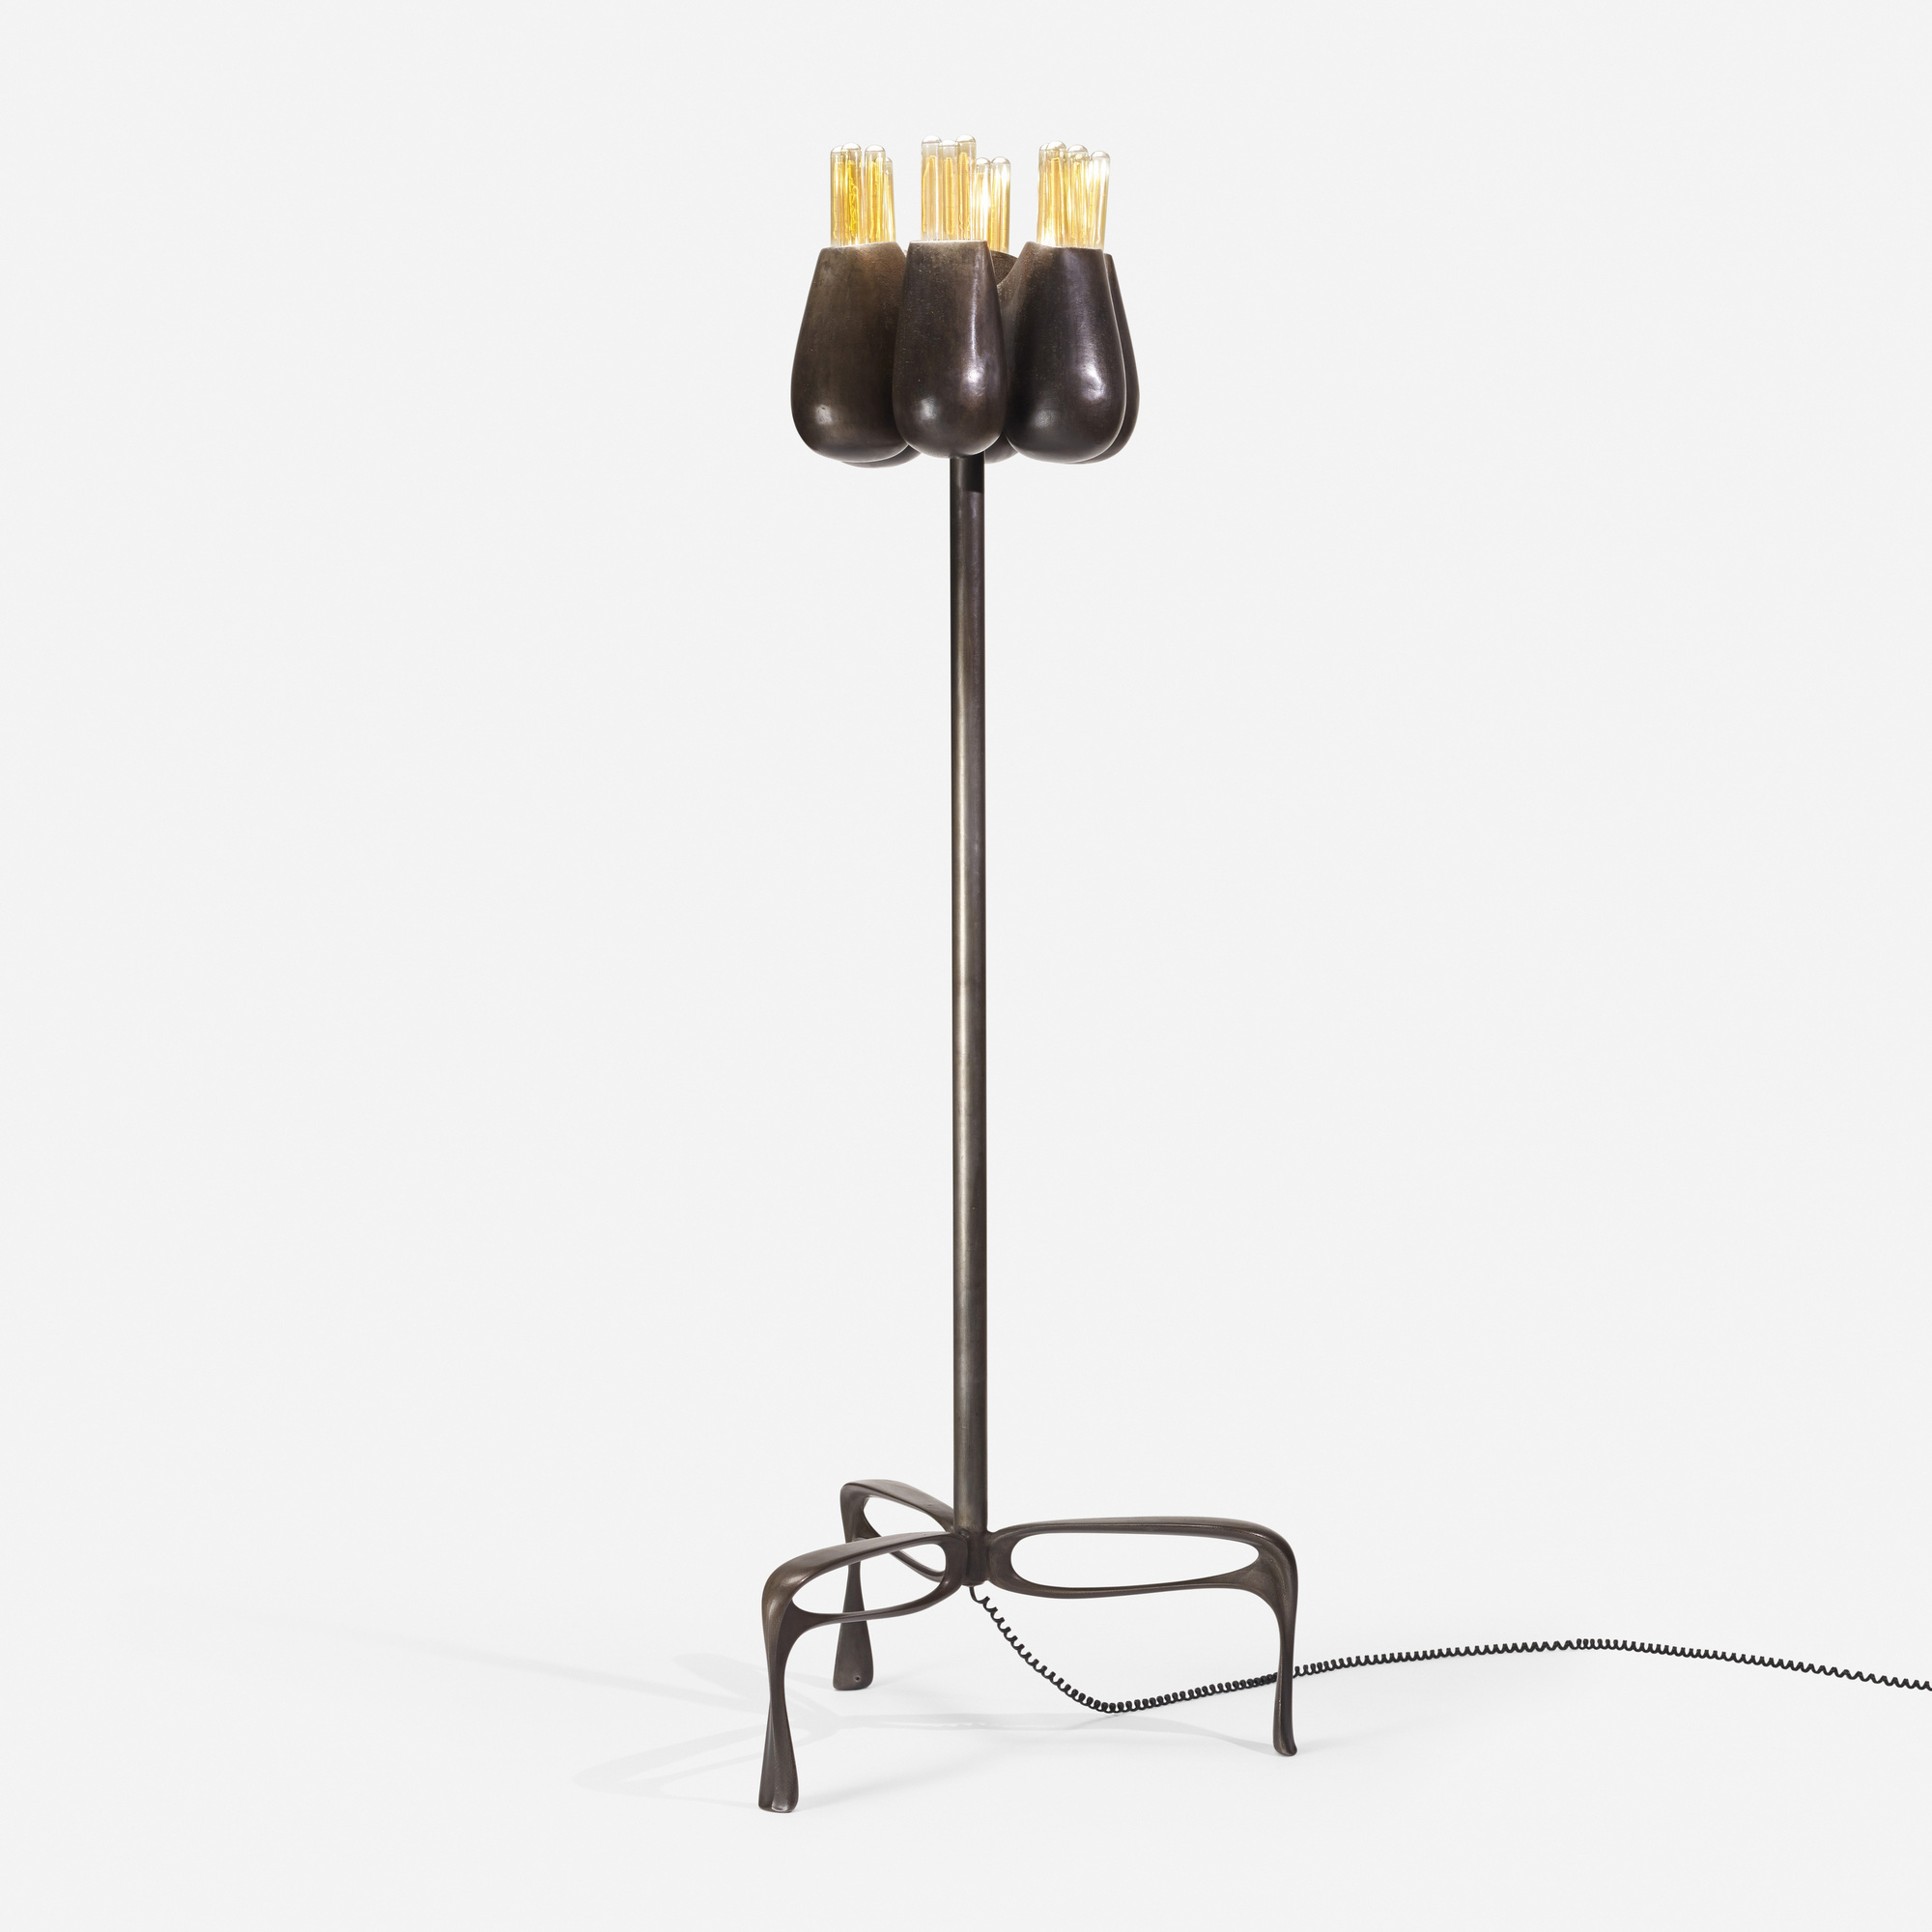 182: Jordan Mozer / Truffala floor lamp (1 of 1)